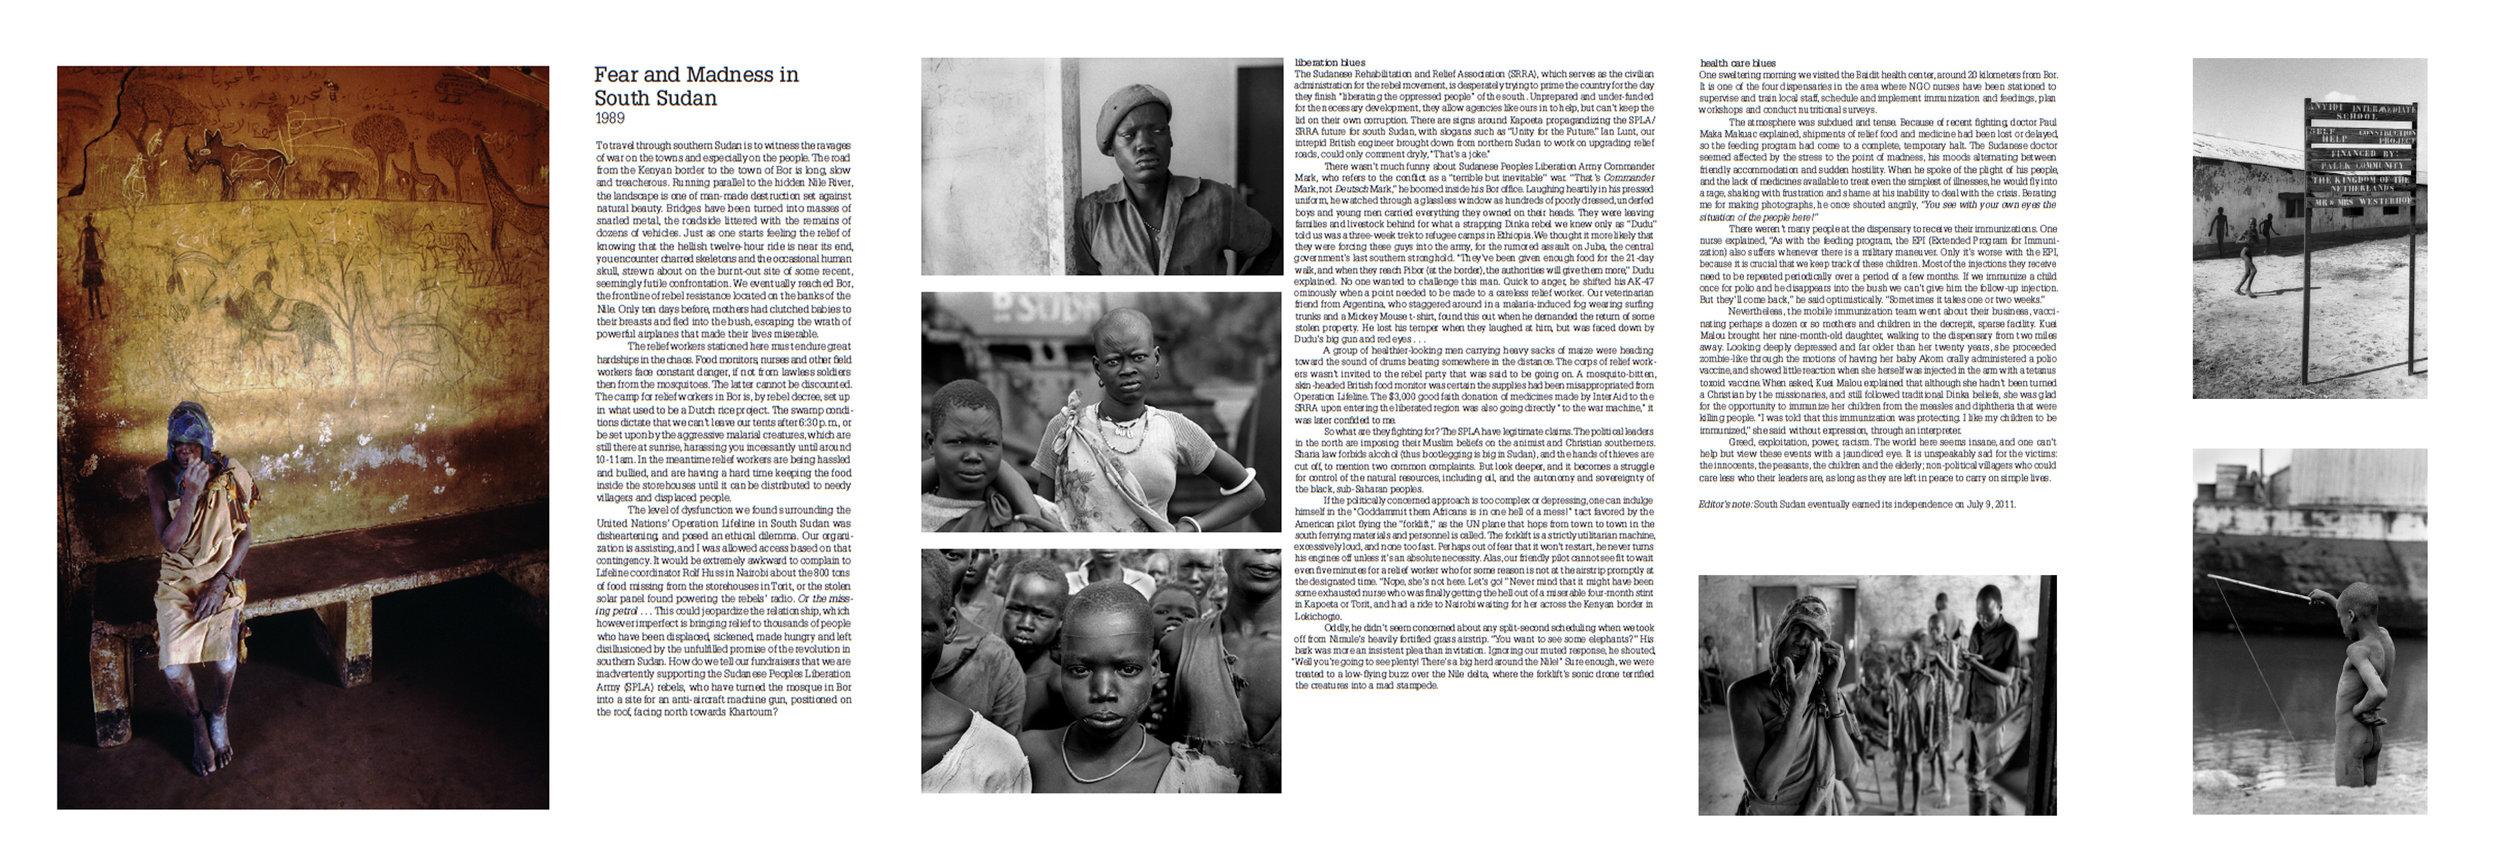 EDGES SUDAN.jpg